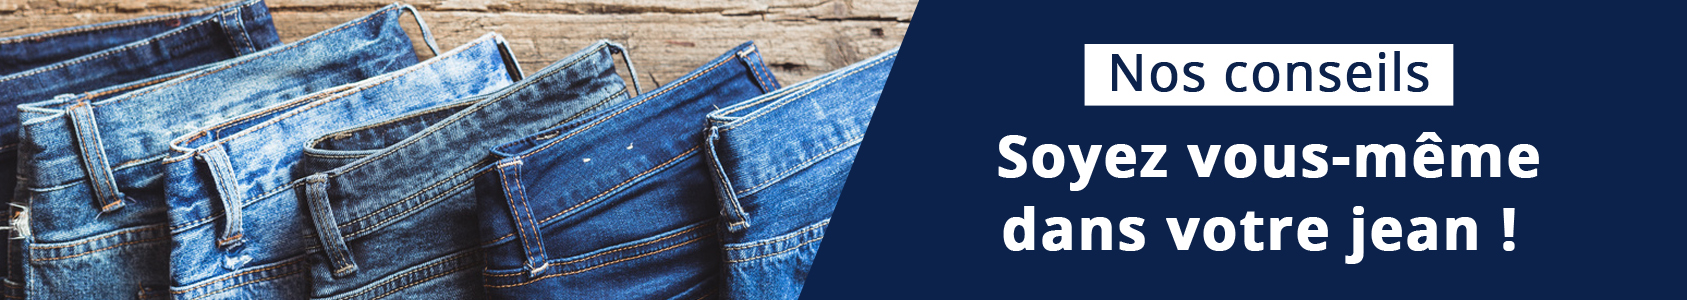 Choisir son jean grande taille homme